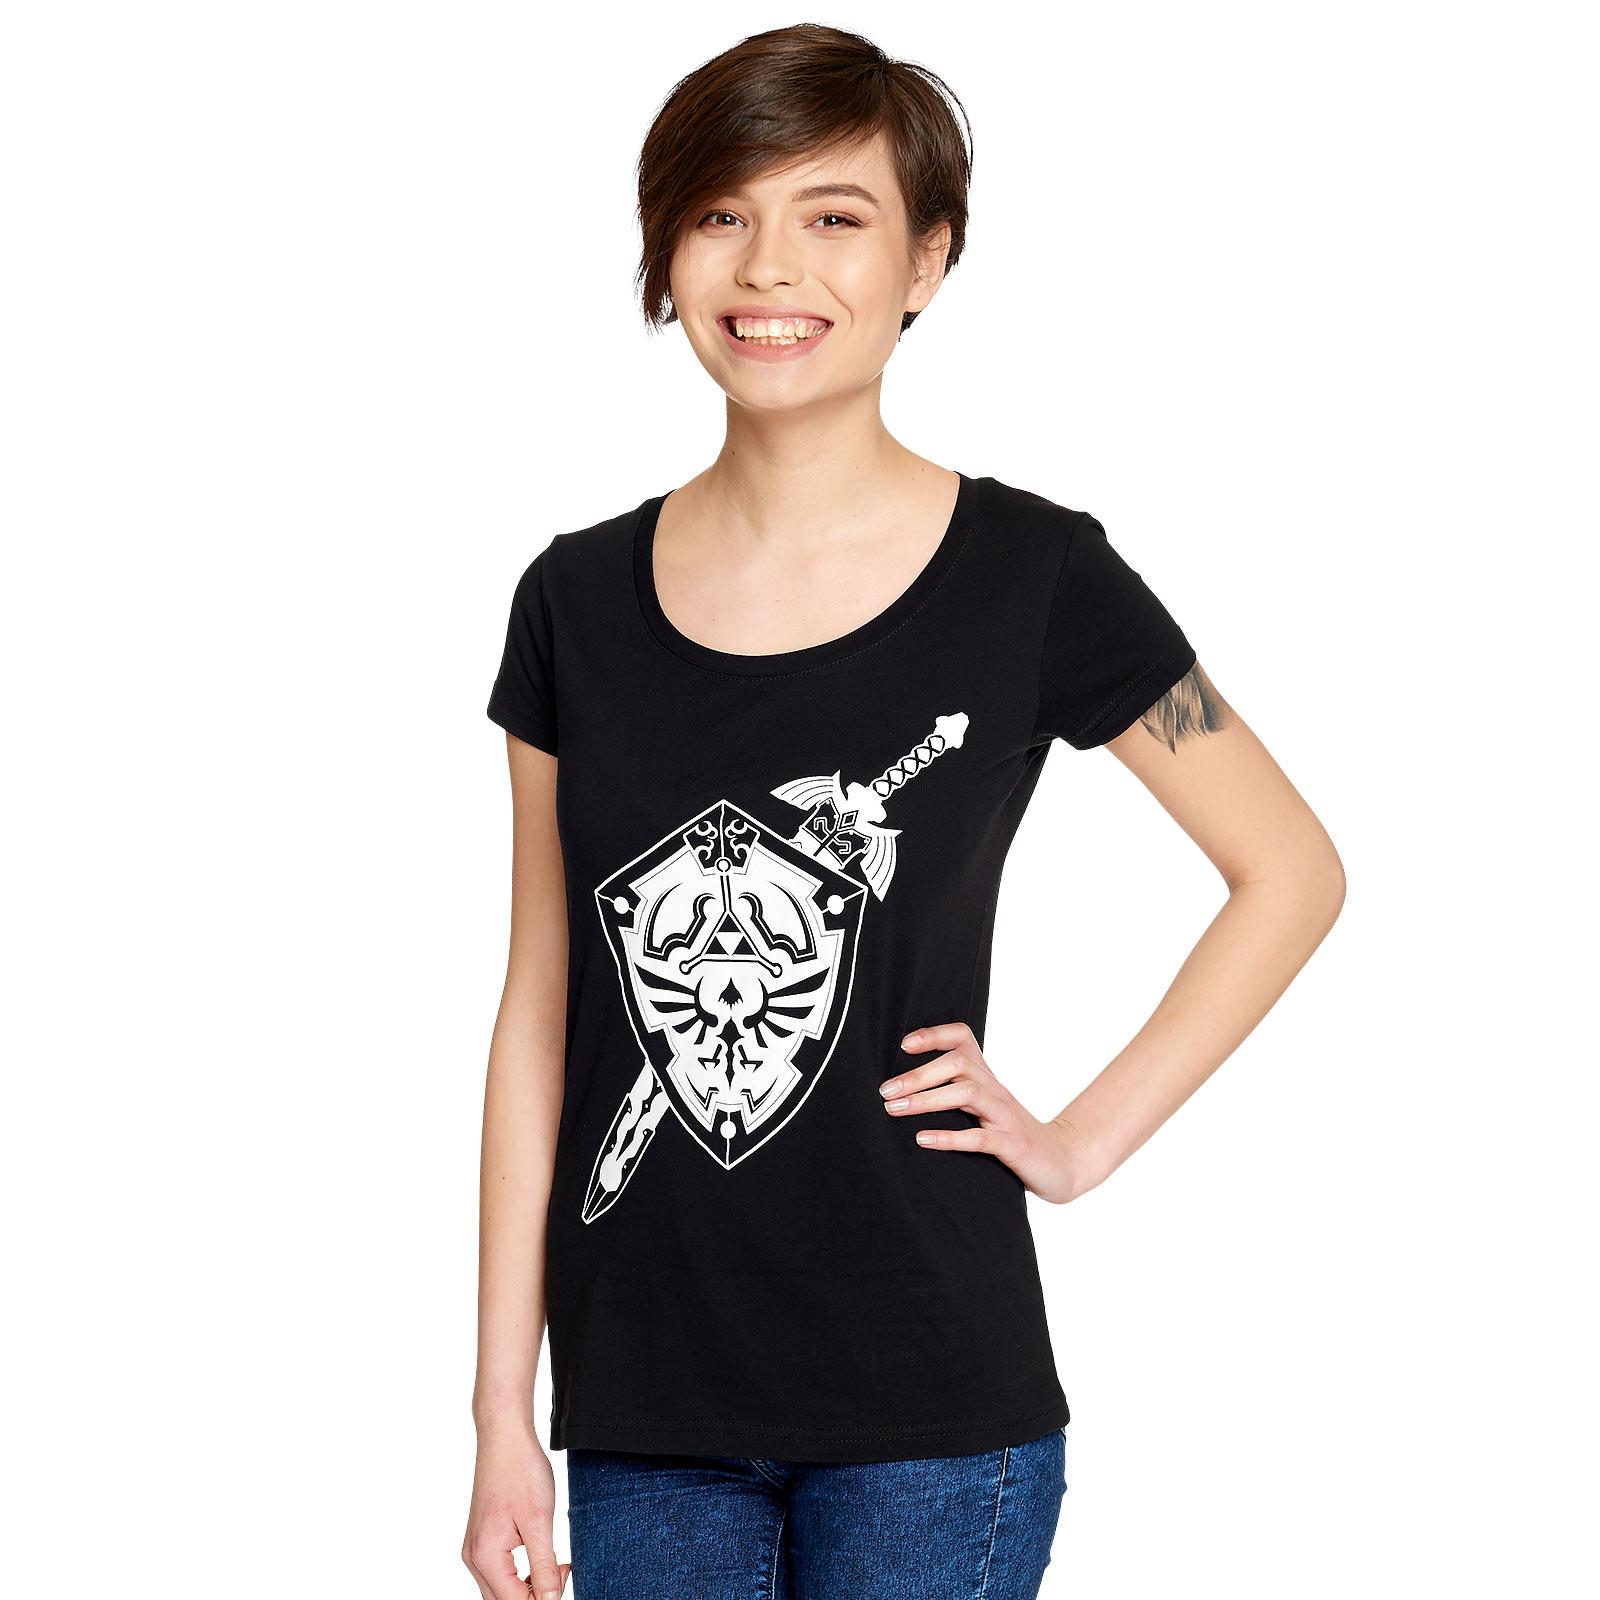 Zelda - Sword and Shield T-Shirt Damen schwarz